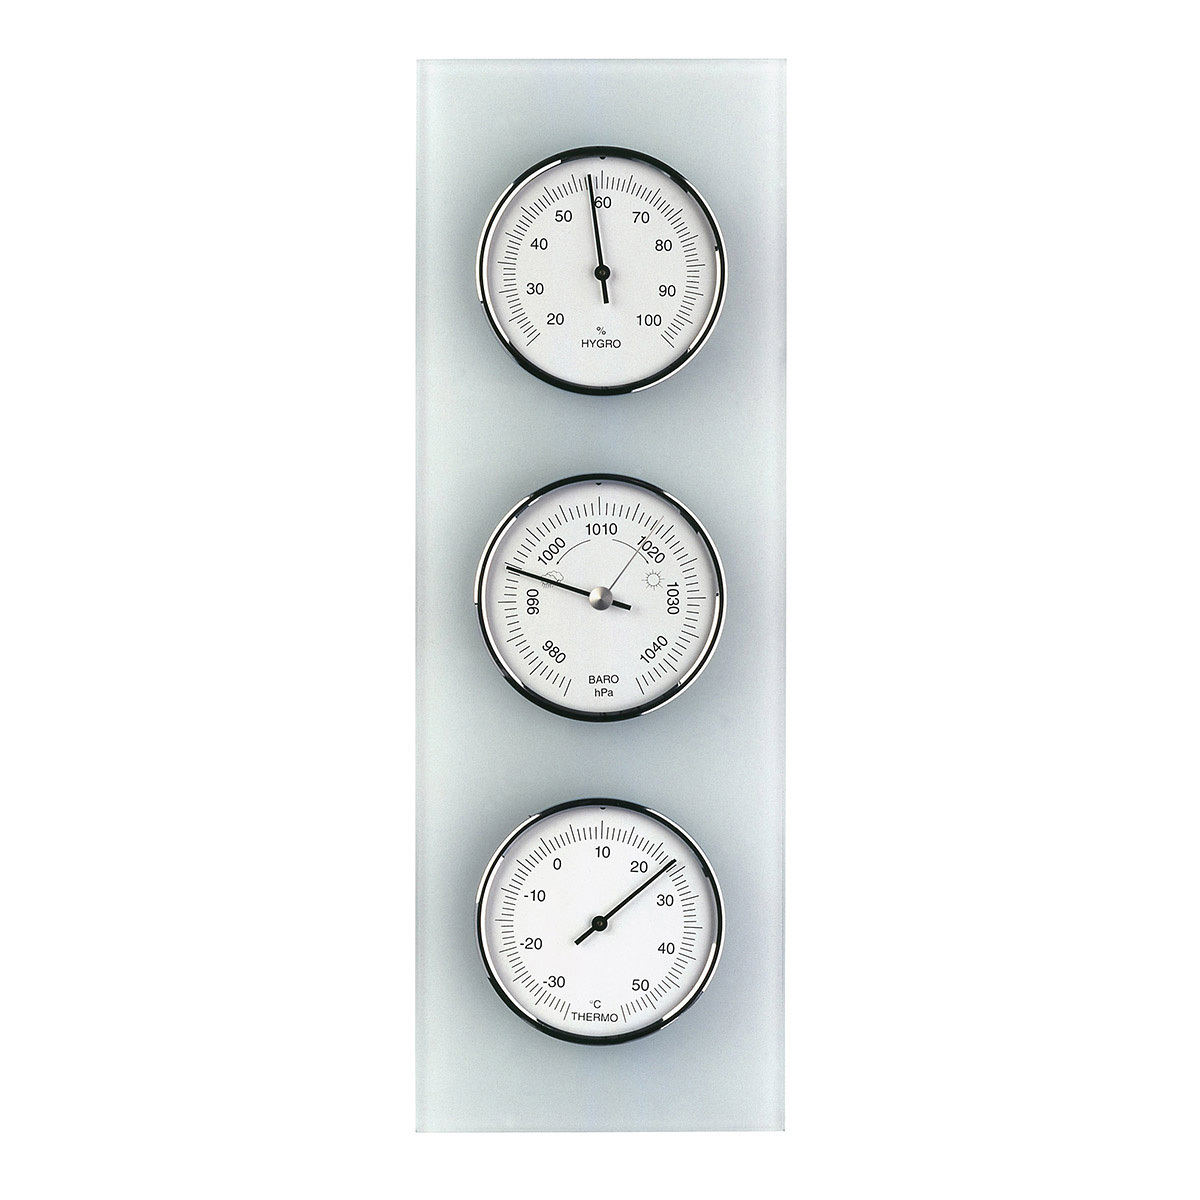 20-3020-02-analoge-wetterstation-glas-1200x1200px.jpg